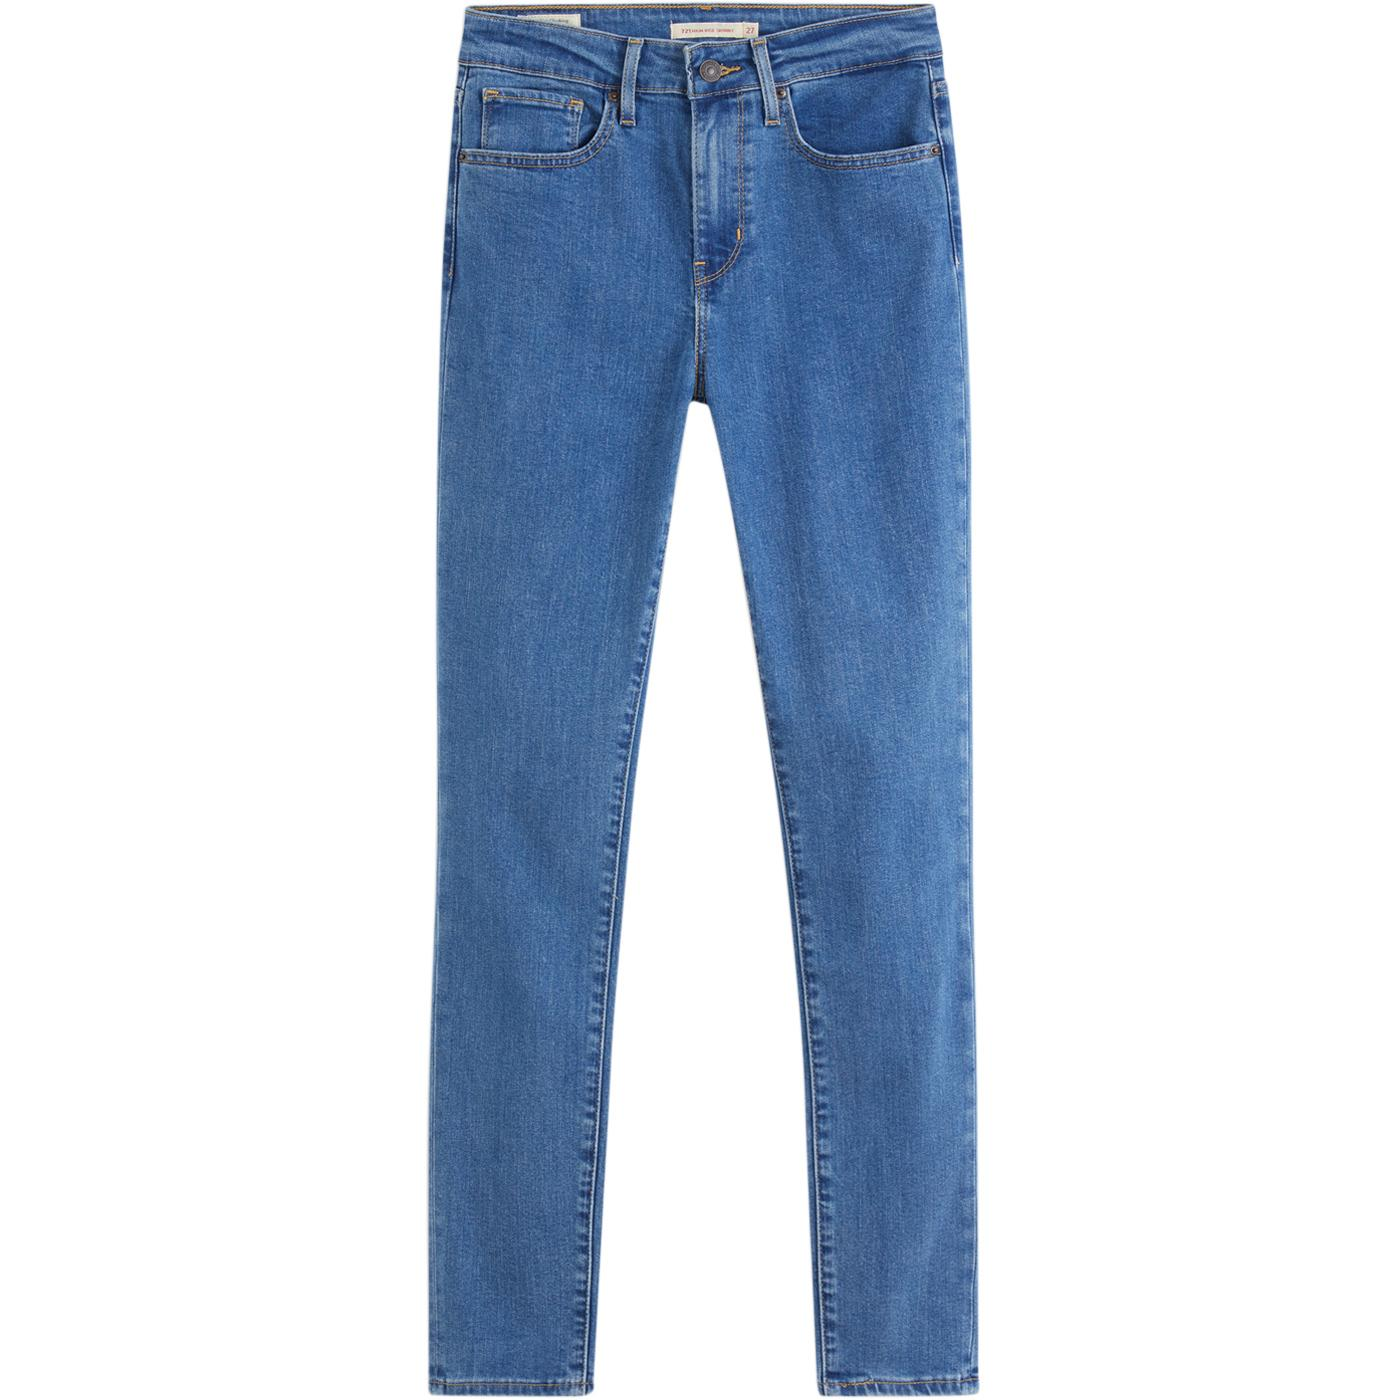 LEVI'S 721 High Rise Skinny Jeans (Bogota Heart)